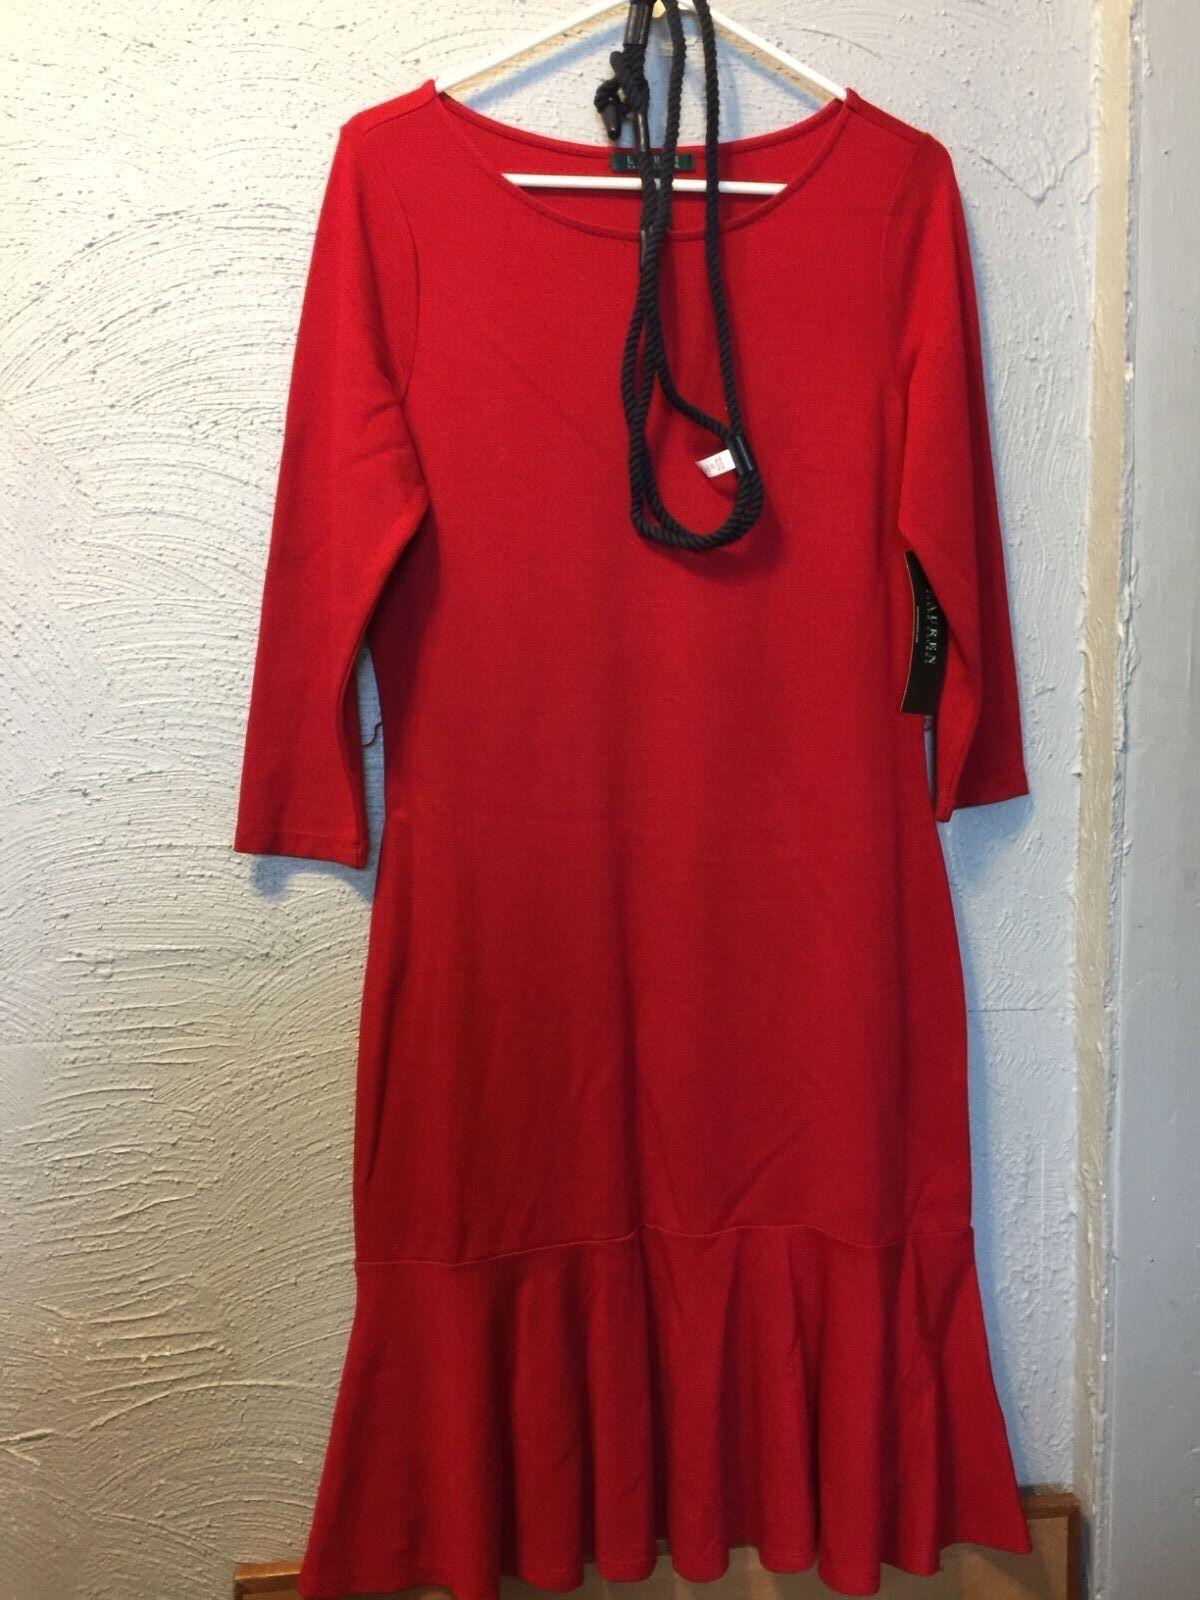 NWT Ralph Lauren Red Drop Waist Tiered Dress w Navy Belt - Size M  MSRP  155.00